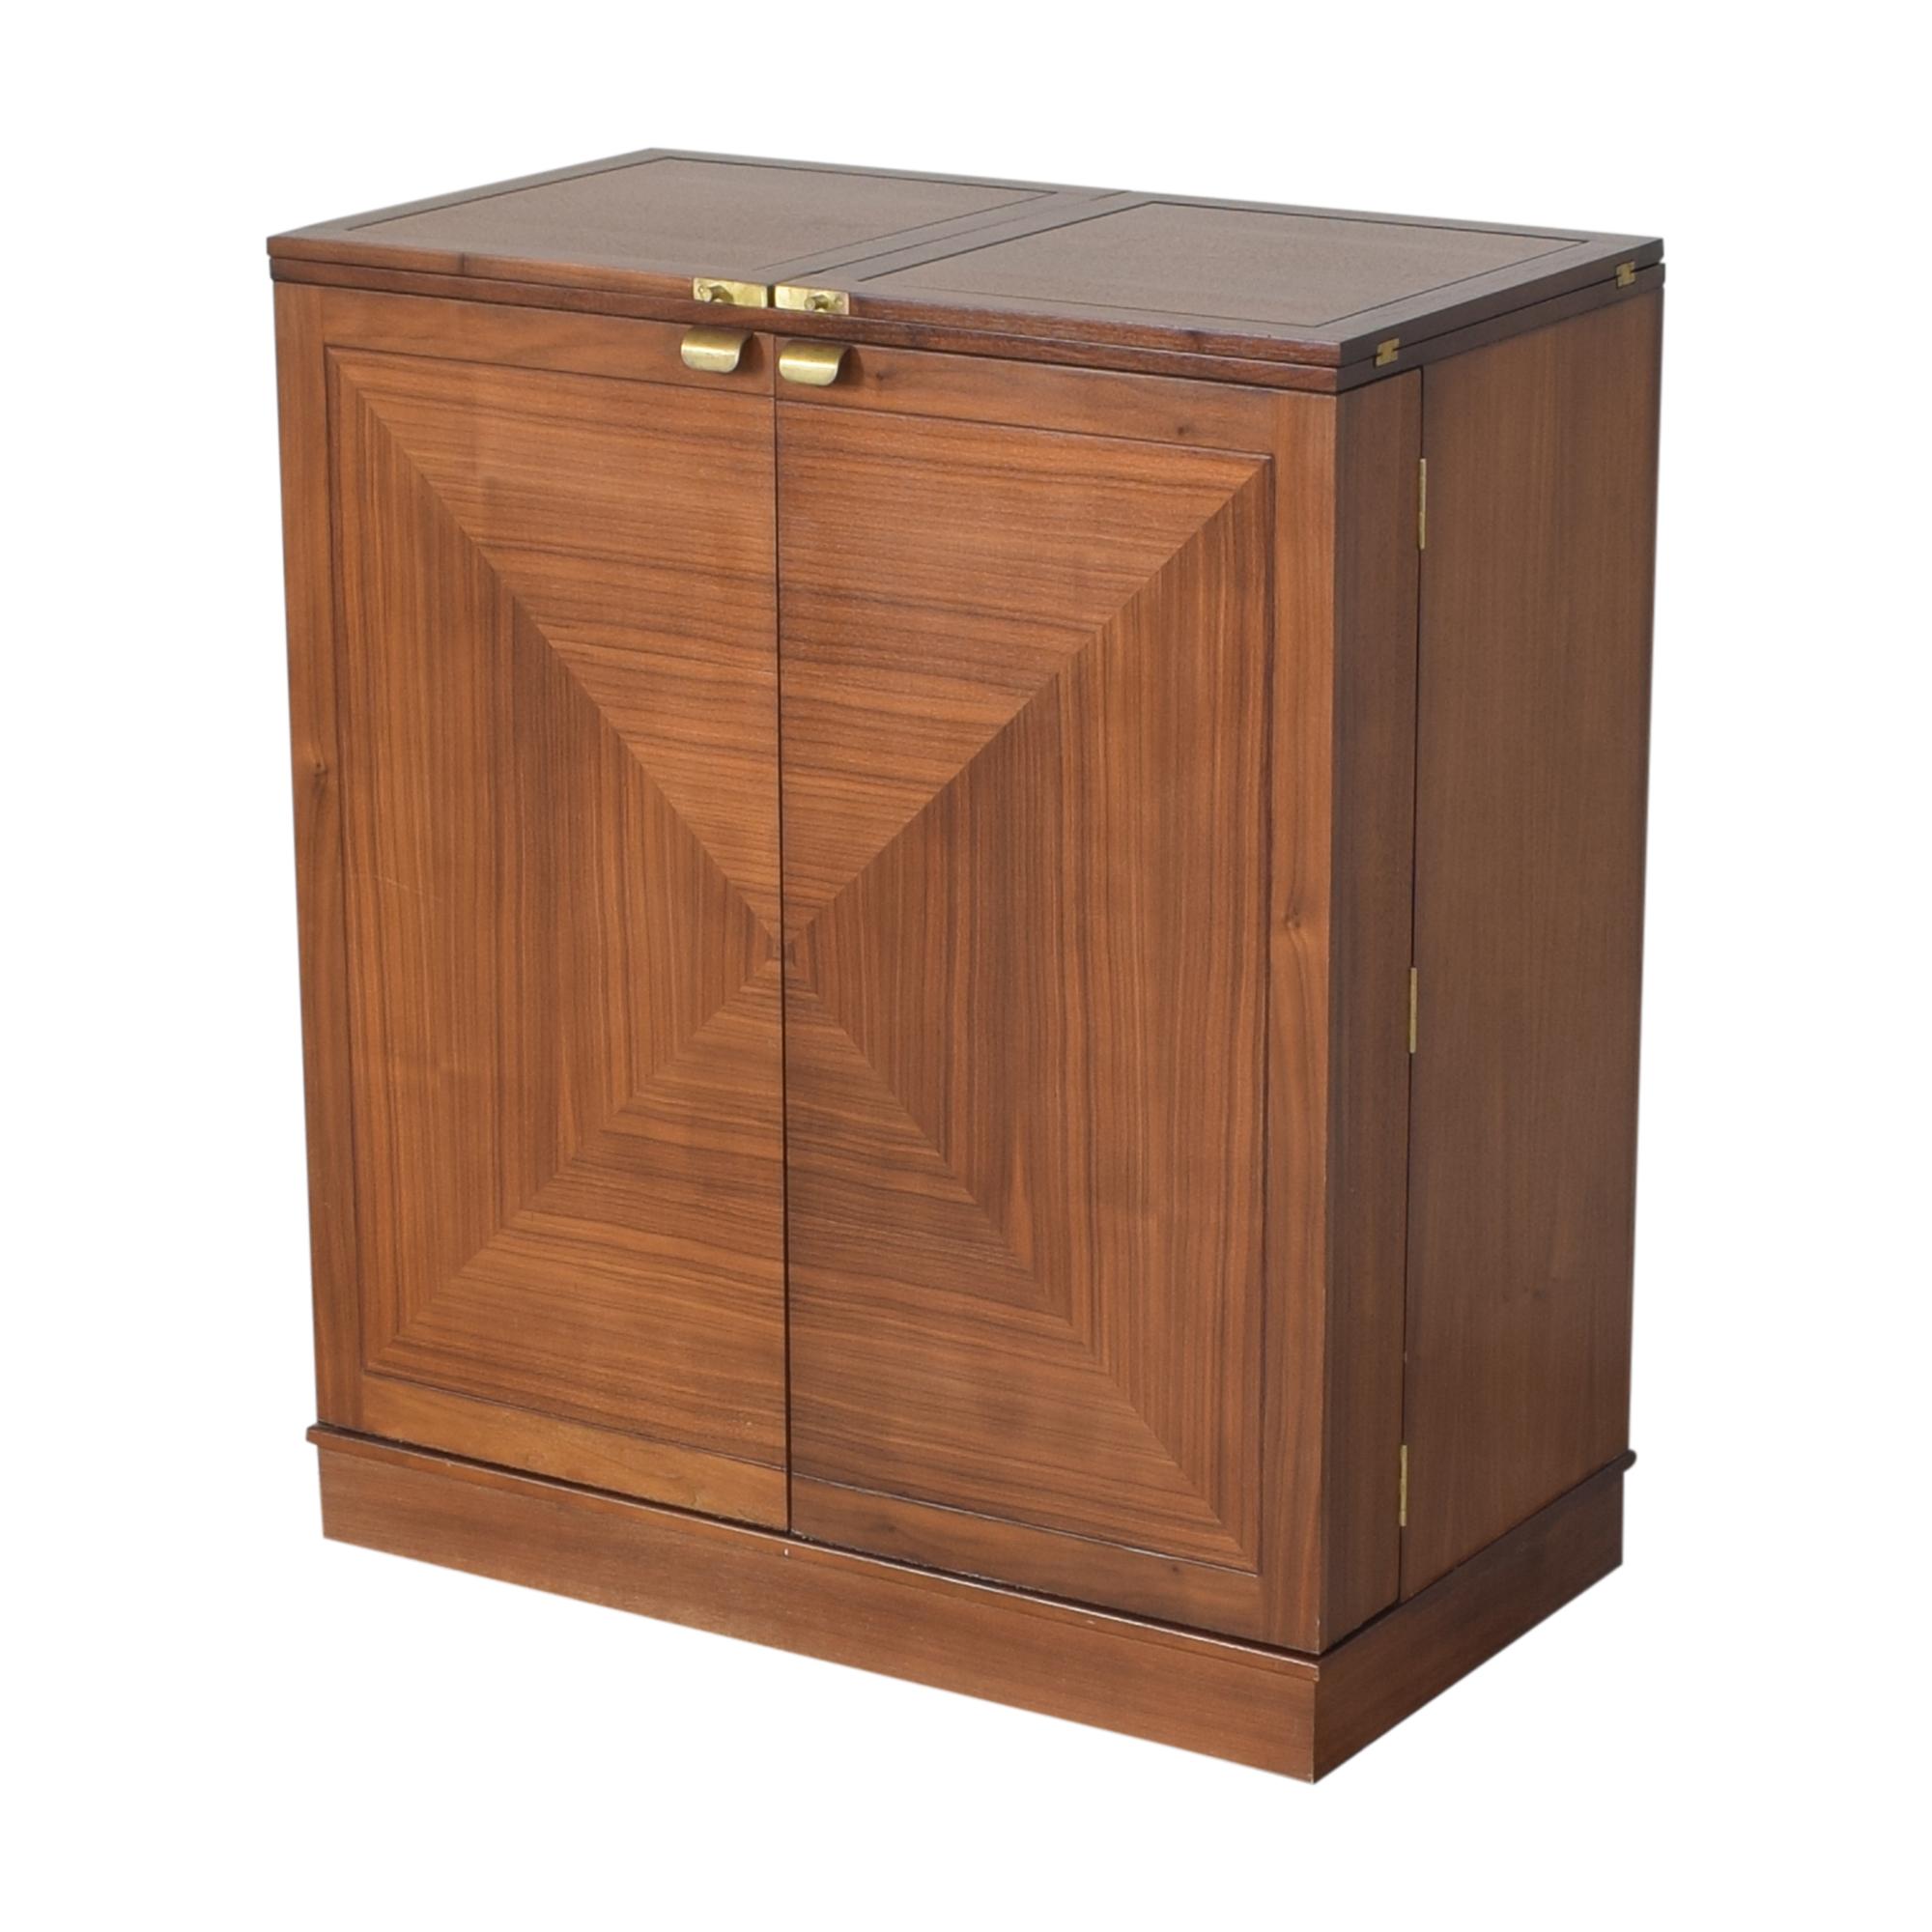 buy Crate & Barrel Maxine Bar Cabinet Crate & Barrel Storage